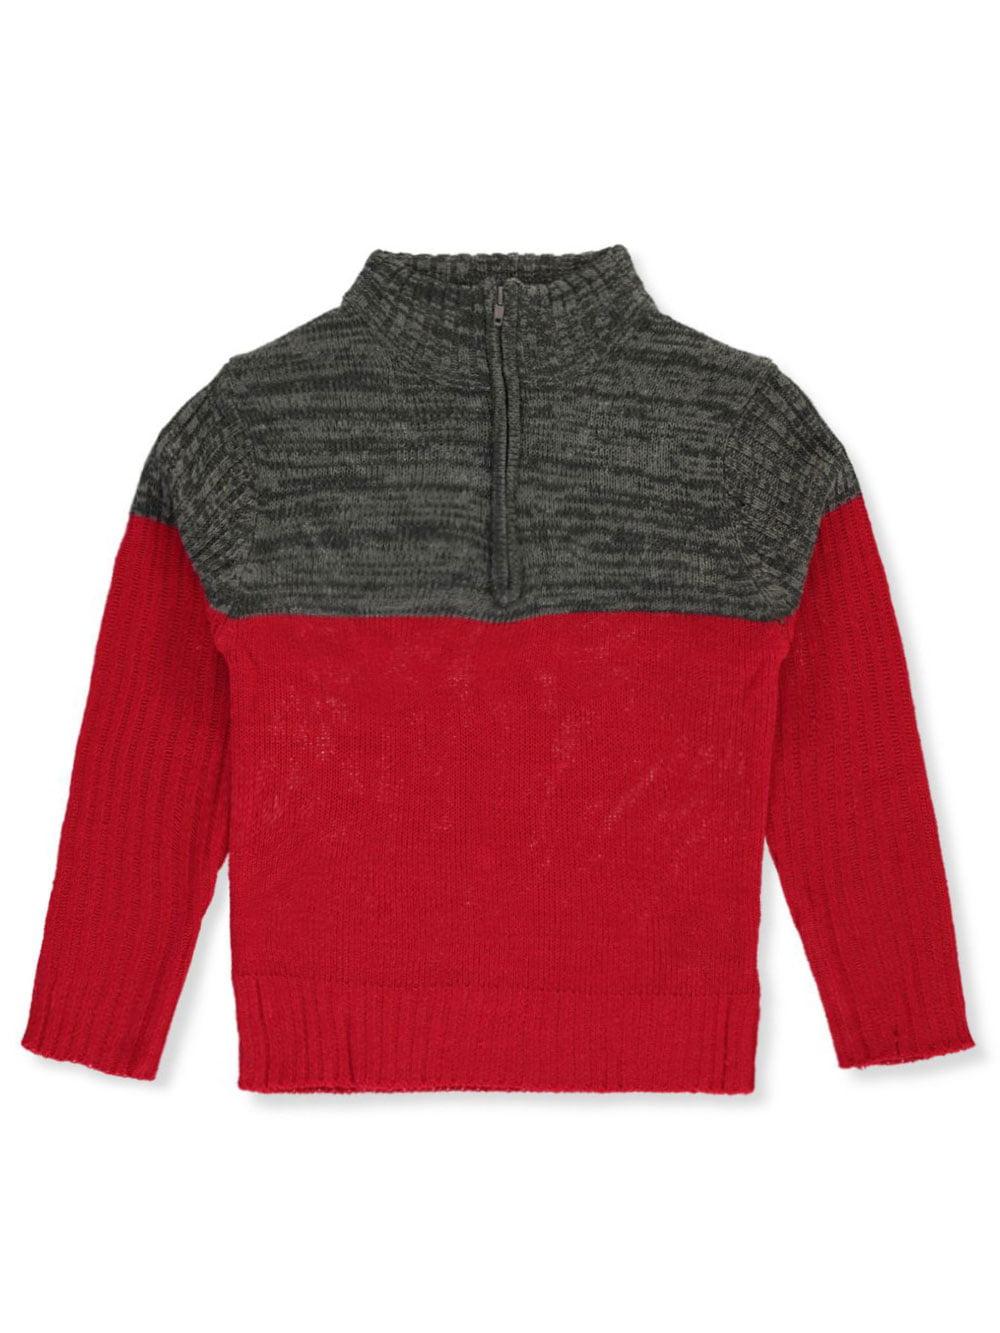 Sezzit Boys Zip Neck Sweater